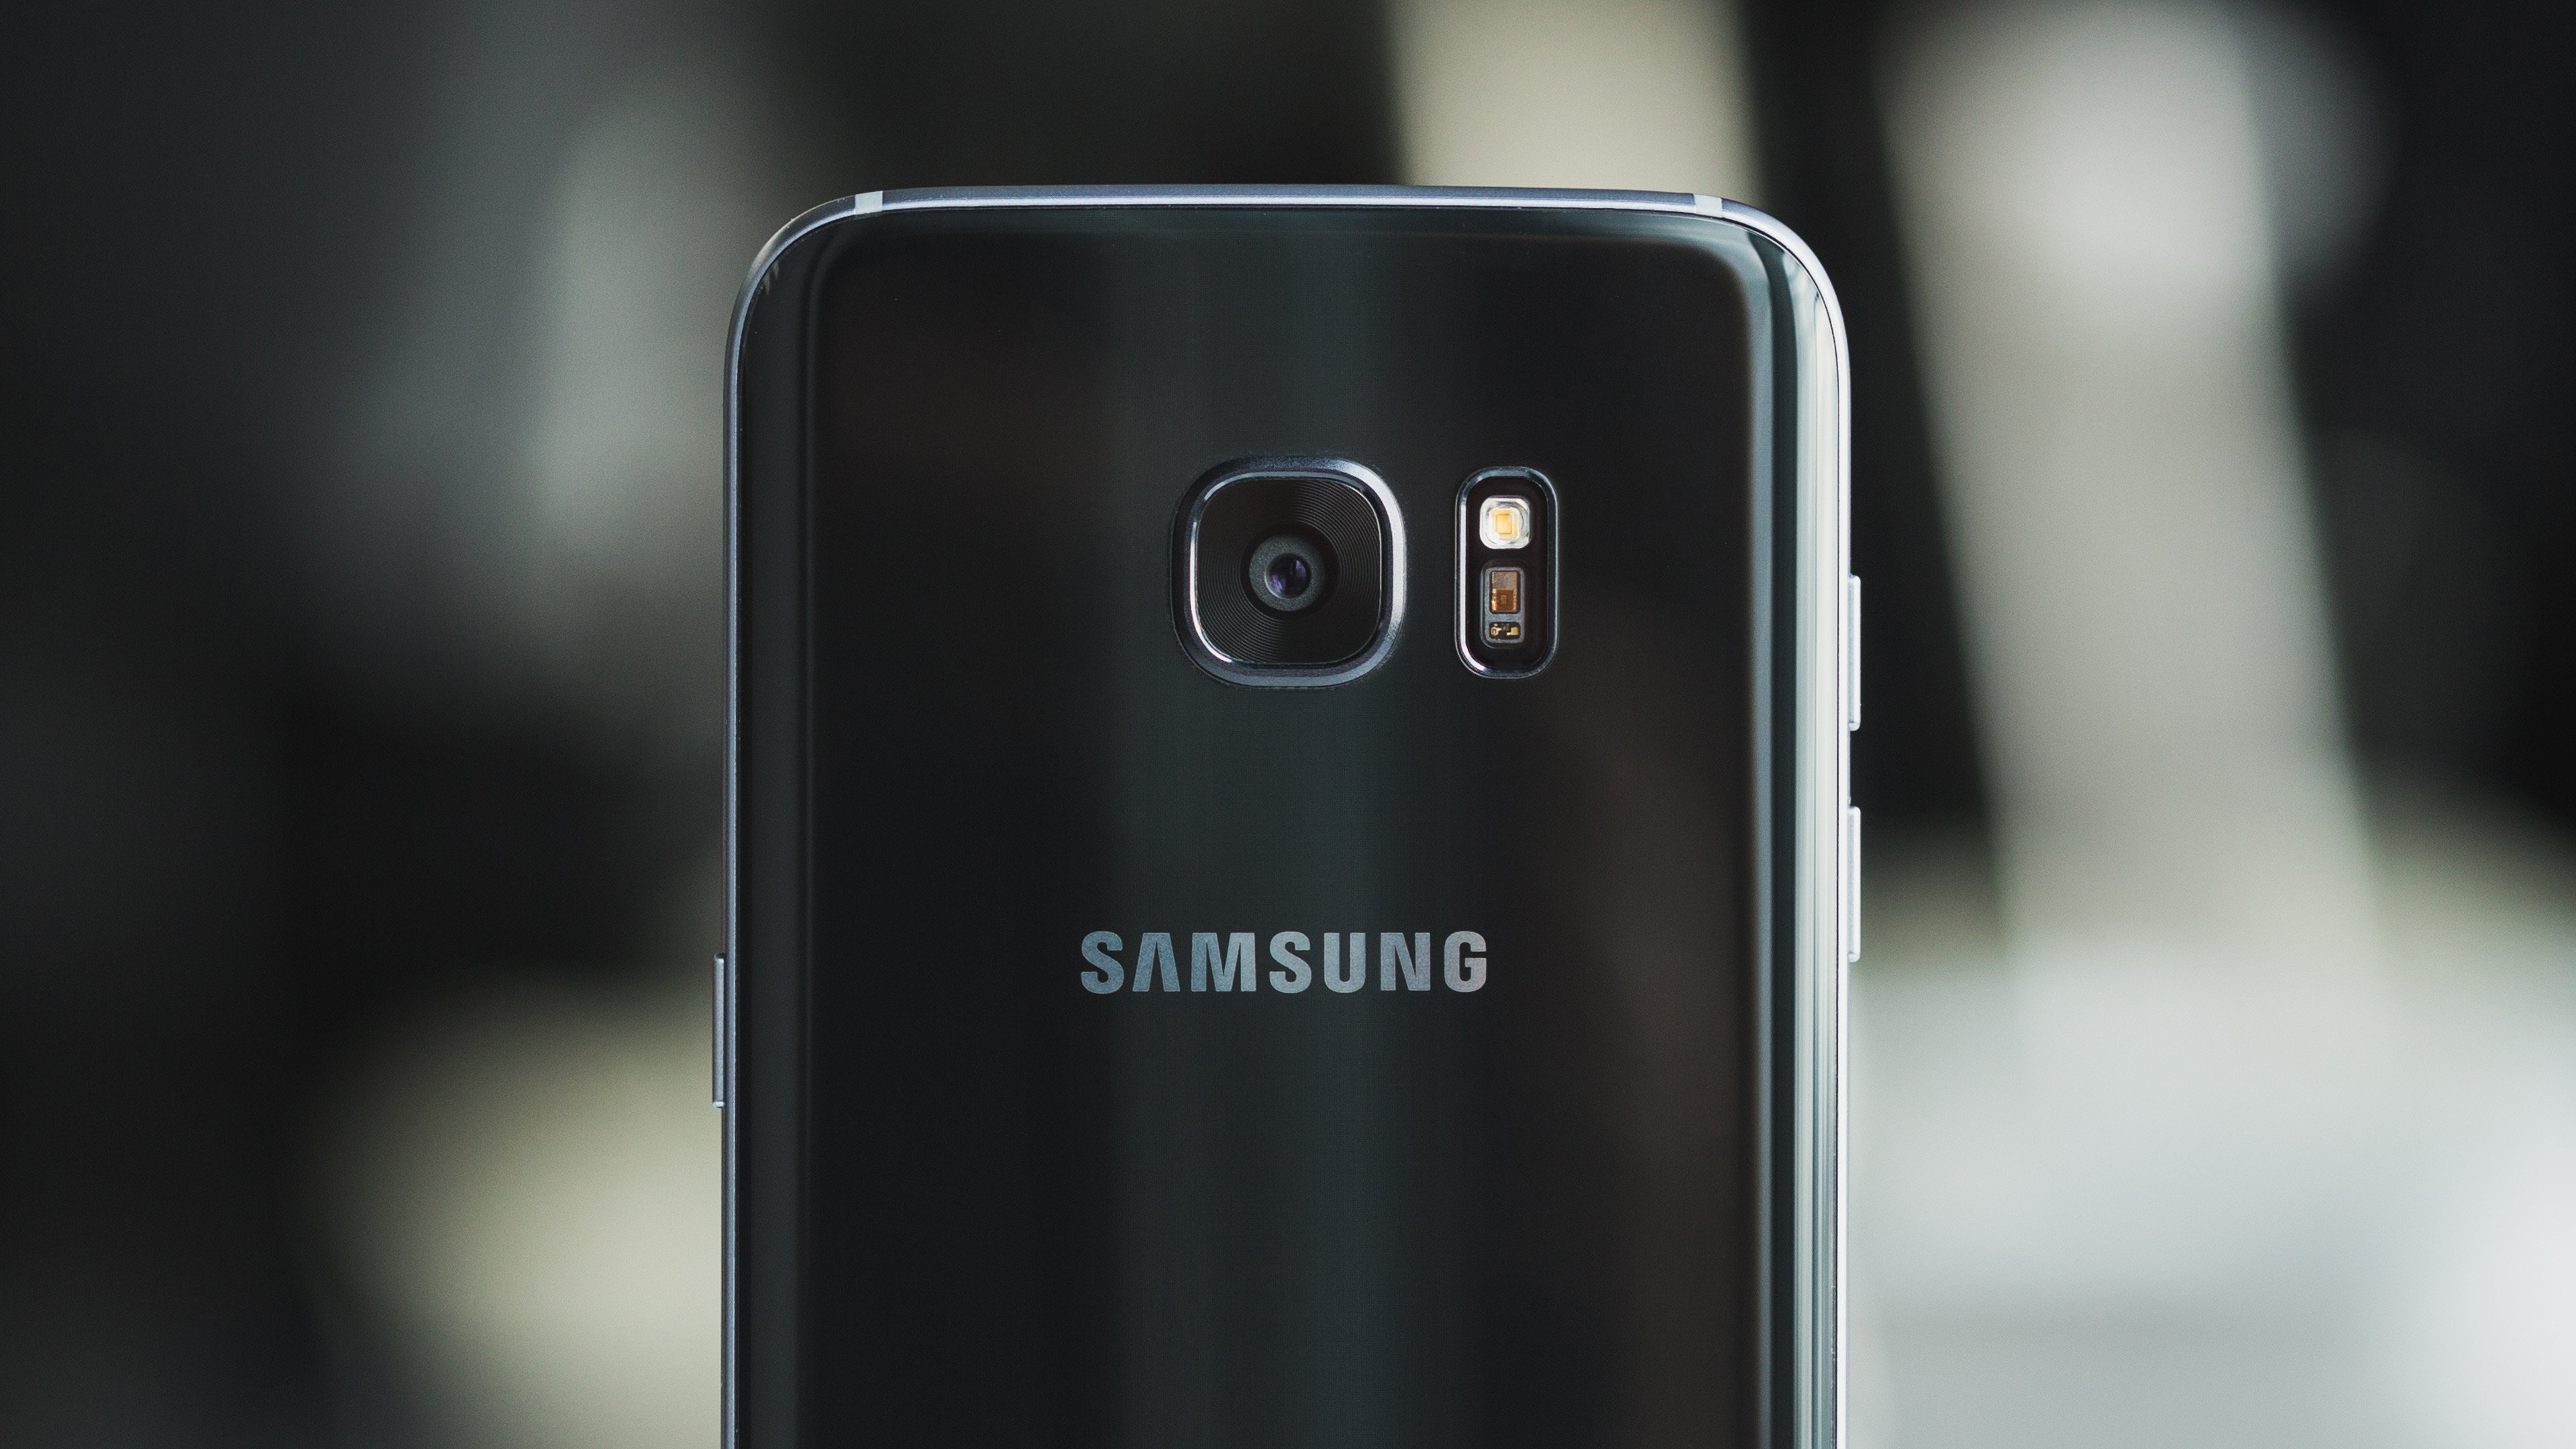 le galaxy s7 edge lu meilleur smartphone aux mobile choice awards 2016 androidpit. Black Bedroom Furniture Sets. Home Design Ideas